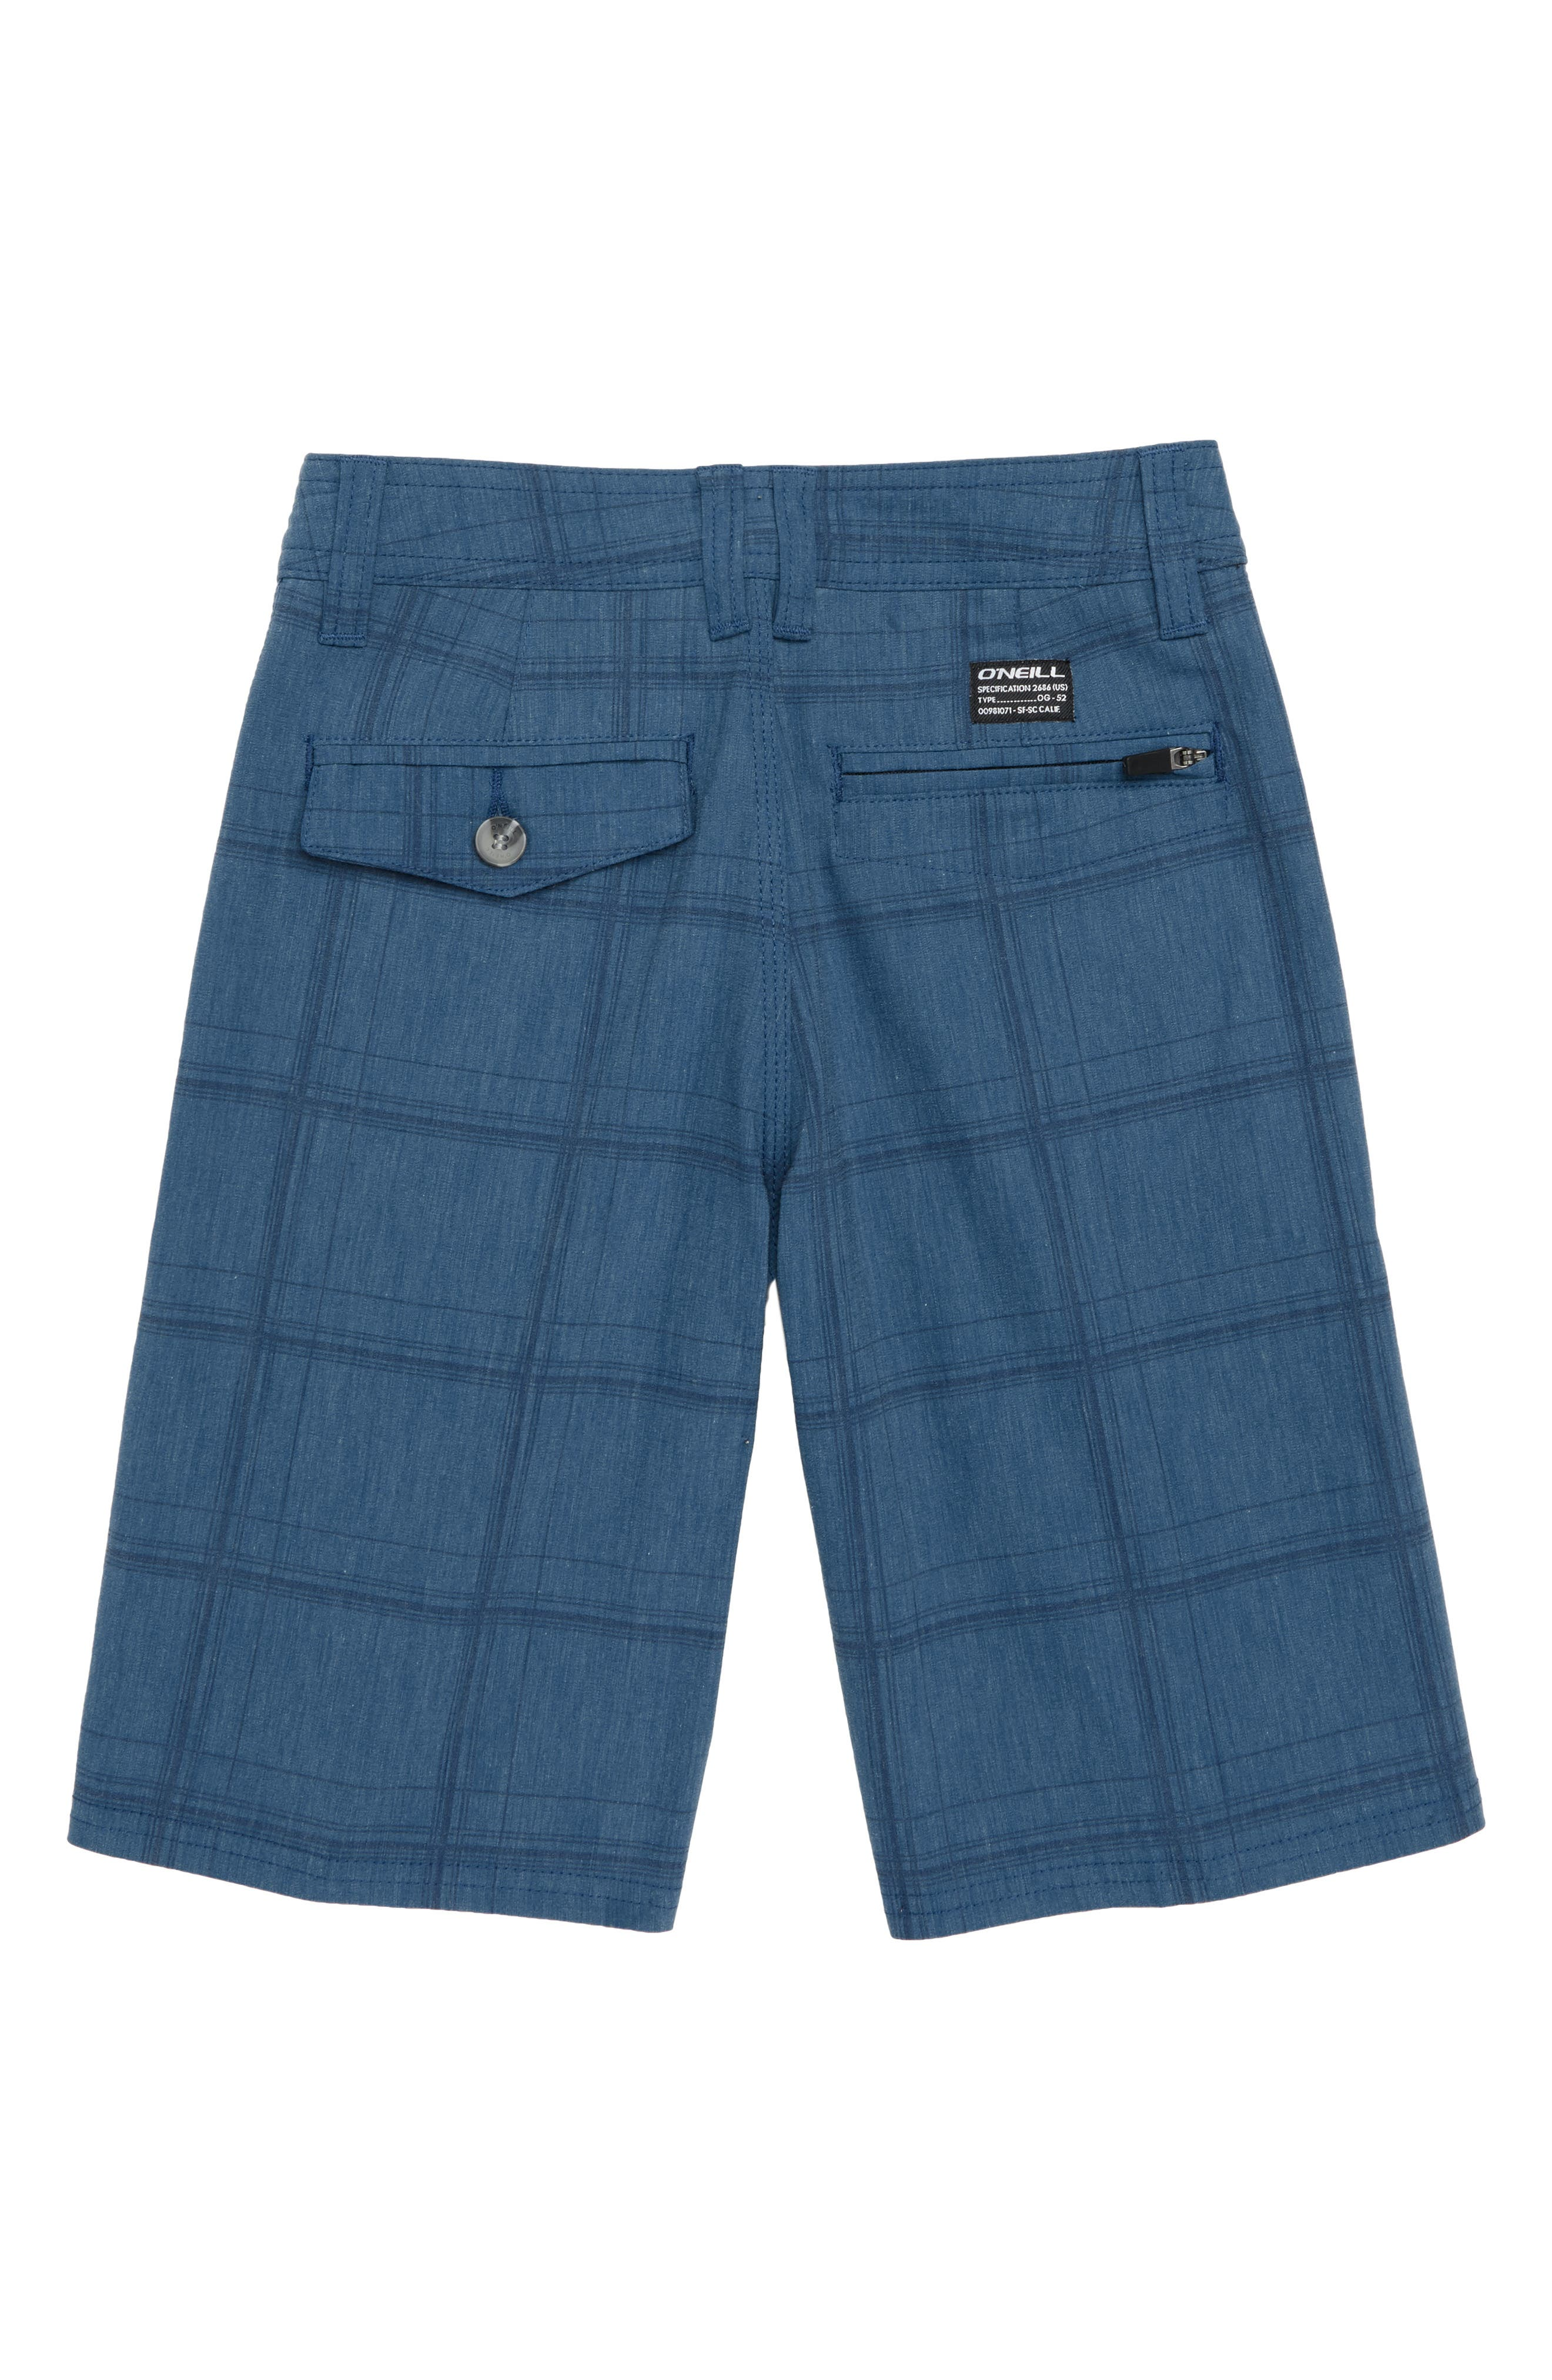 Mixed Hybrid Shorts,                             Alternate thumbnail 2, color,                             Dark Blue